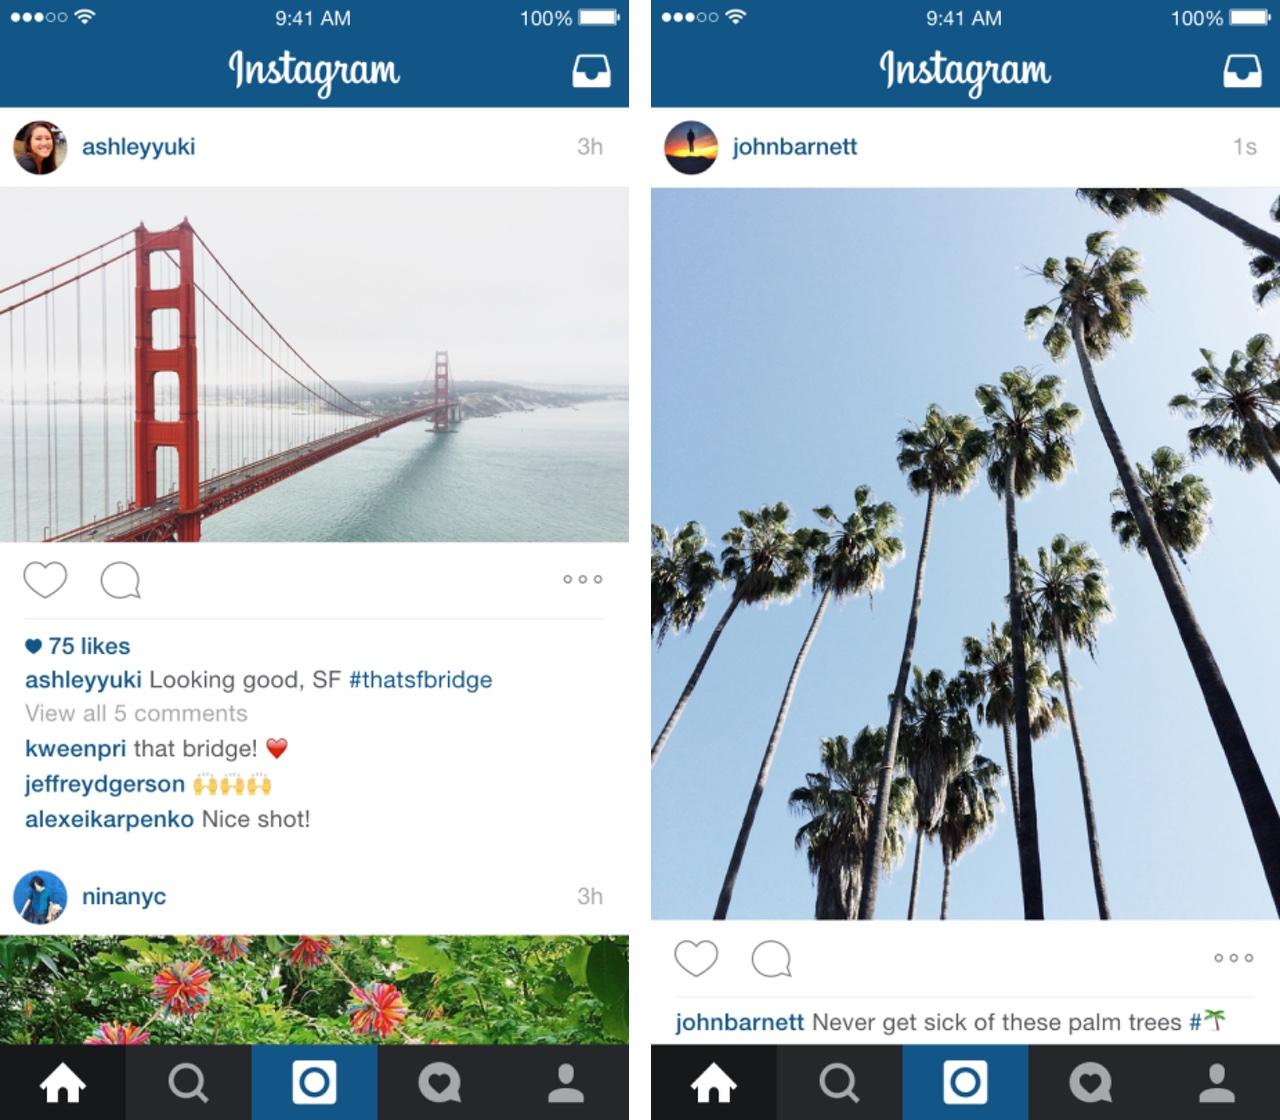 Instagram Portrait and Landscape